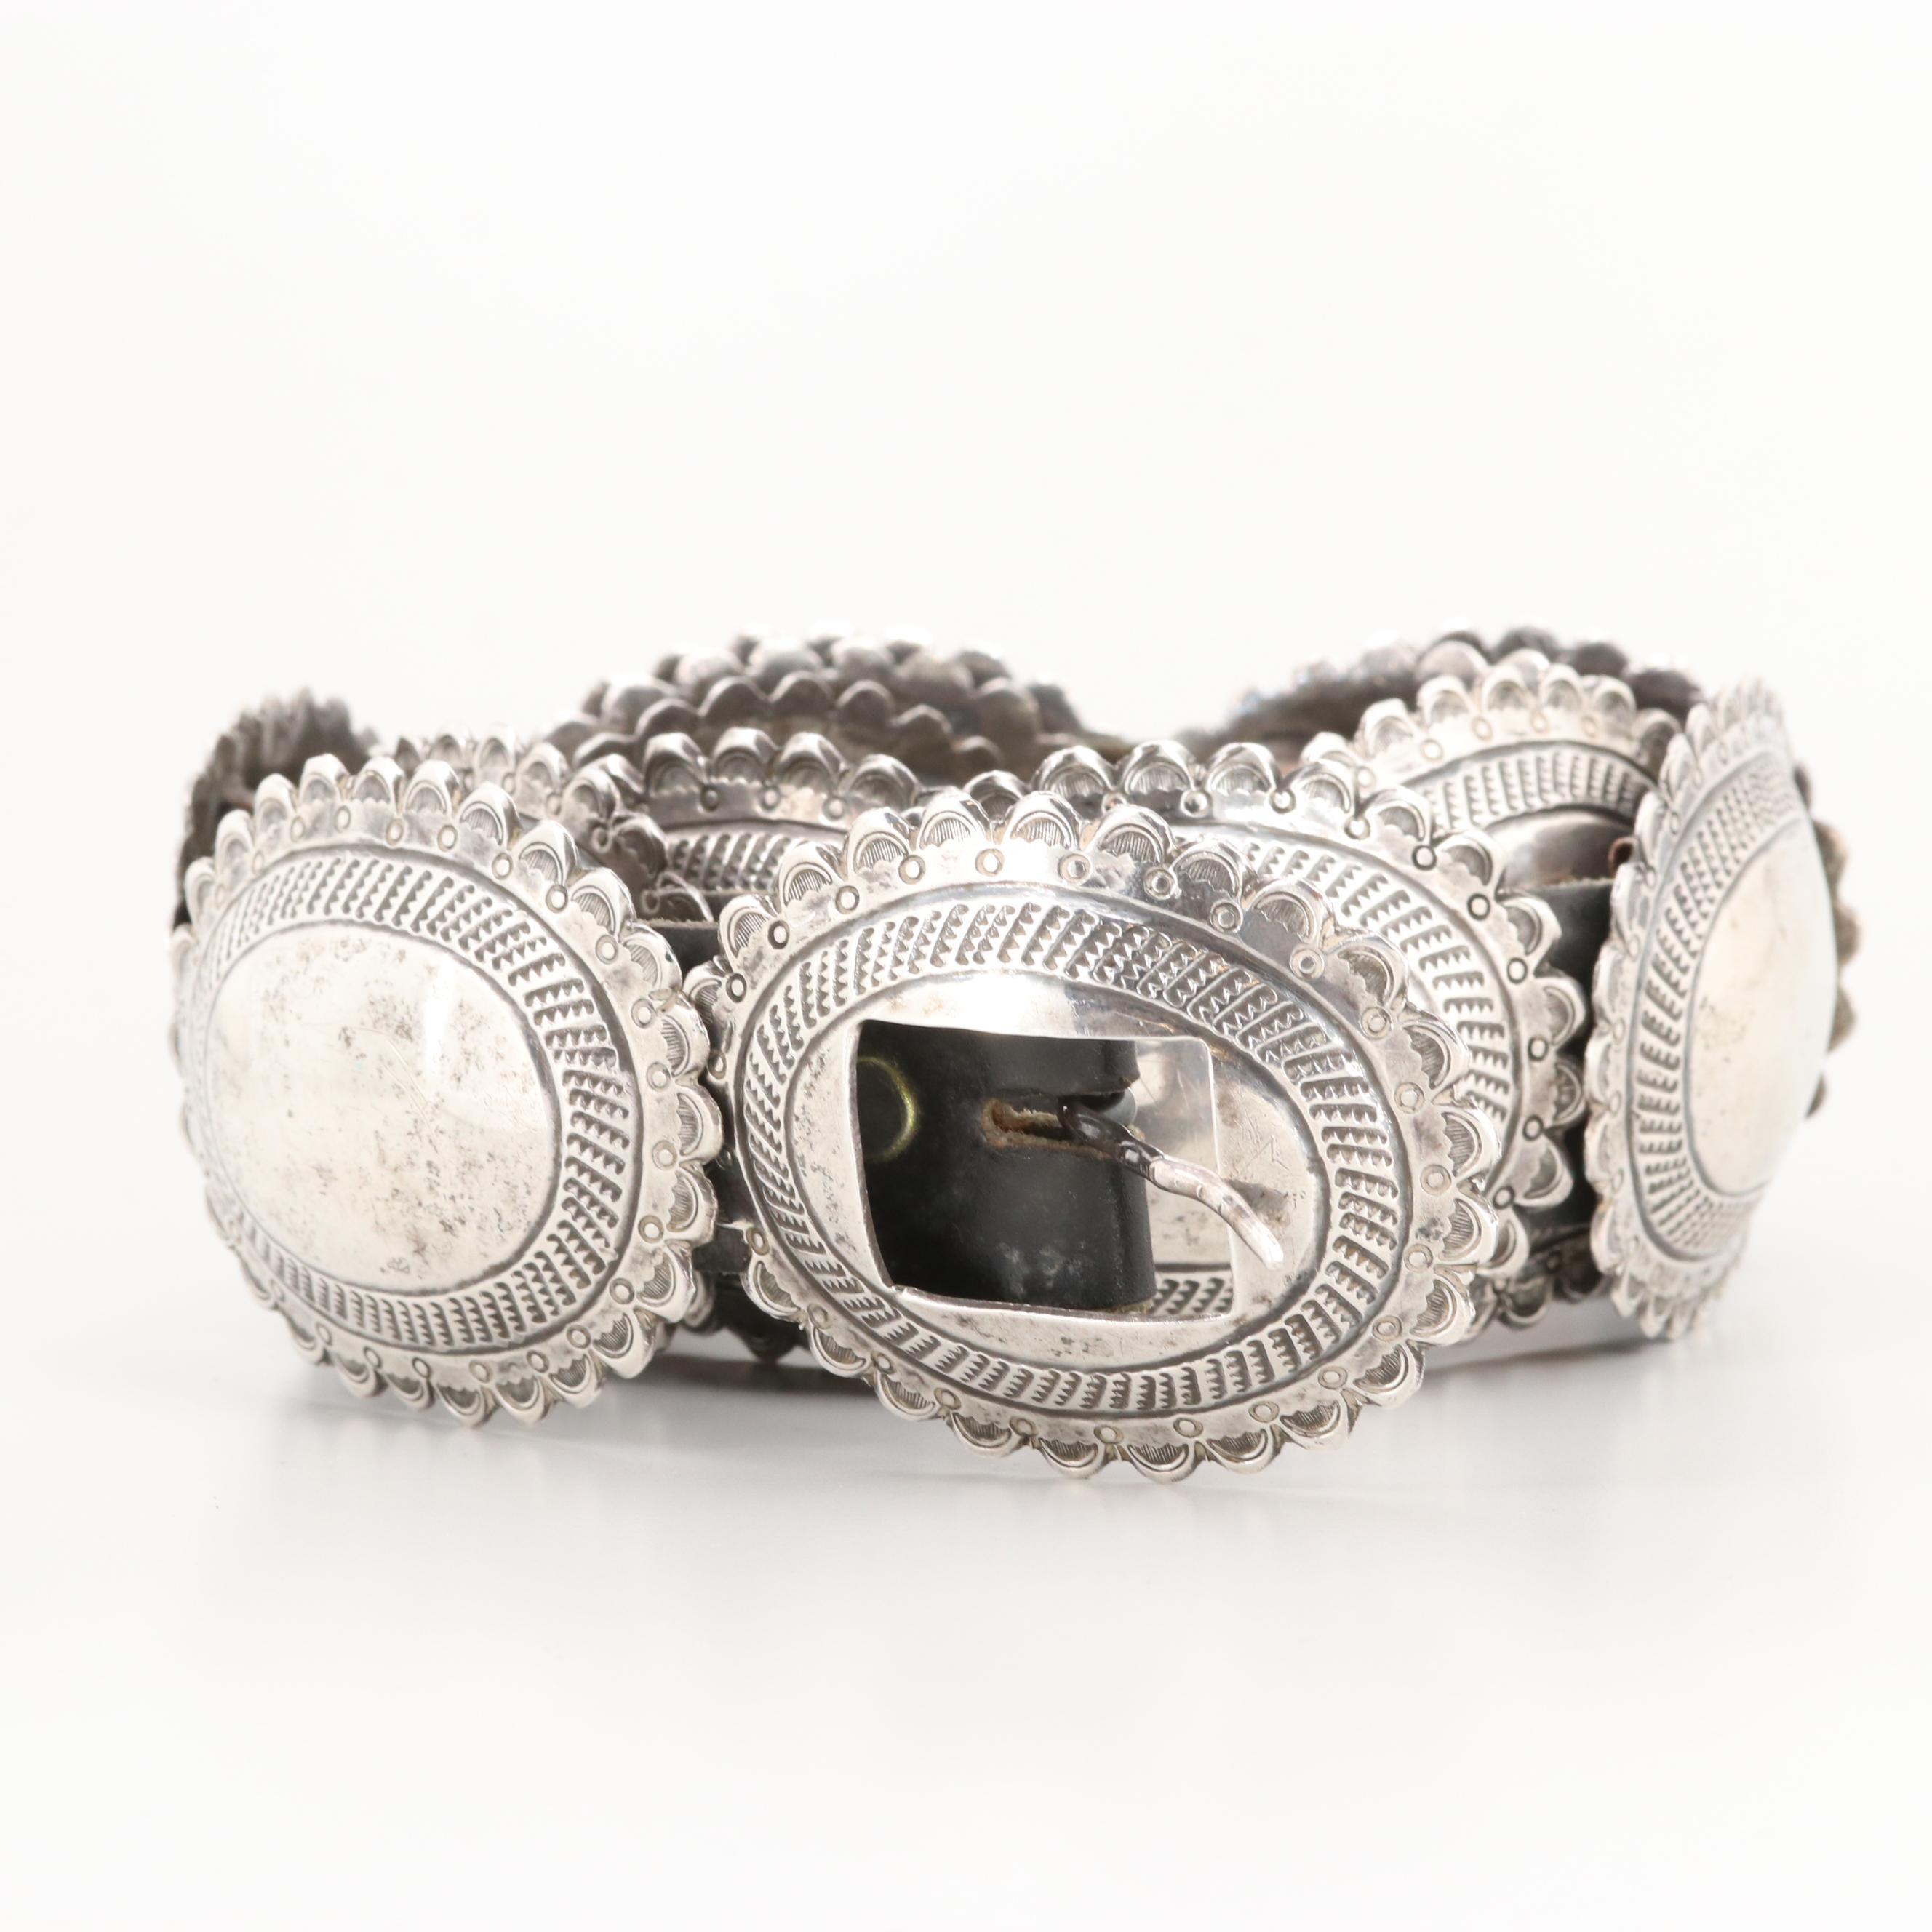 Southwestern Style Sterling Silver Concho Belt